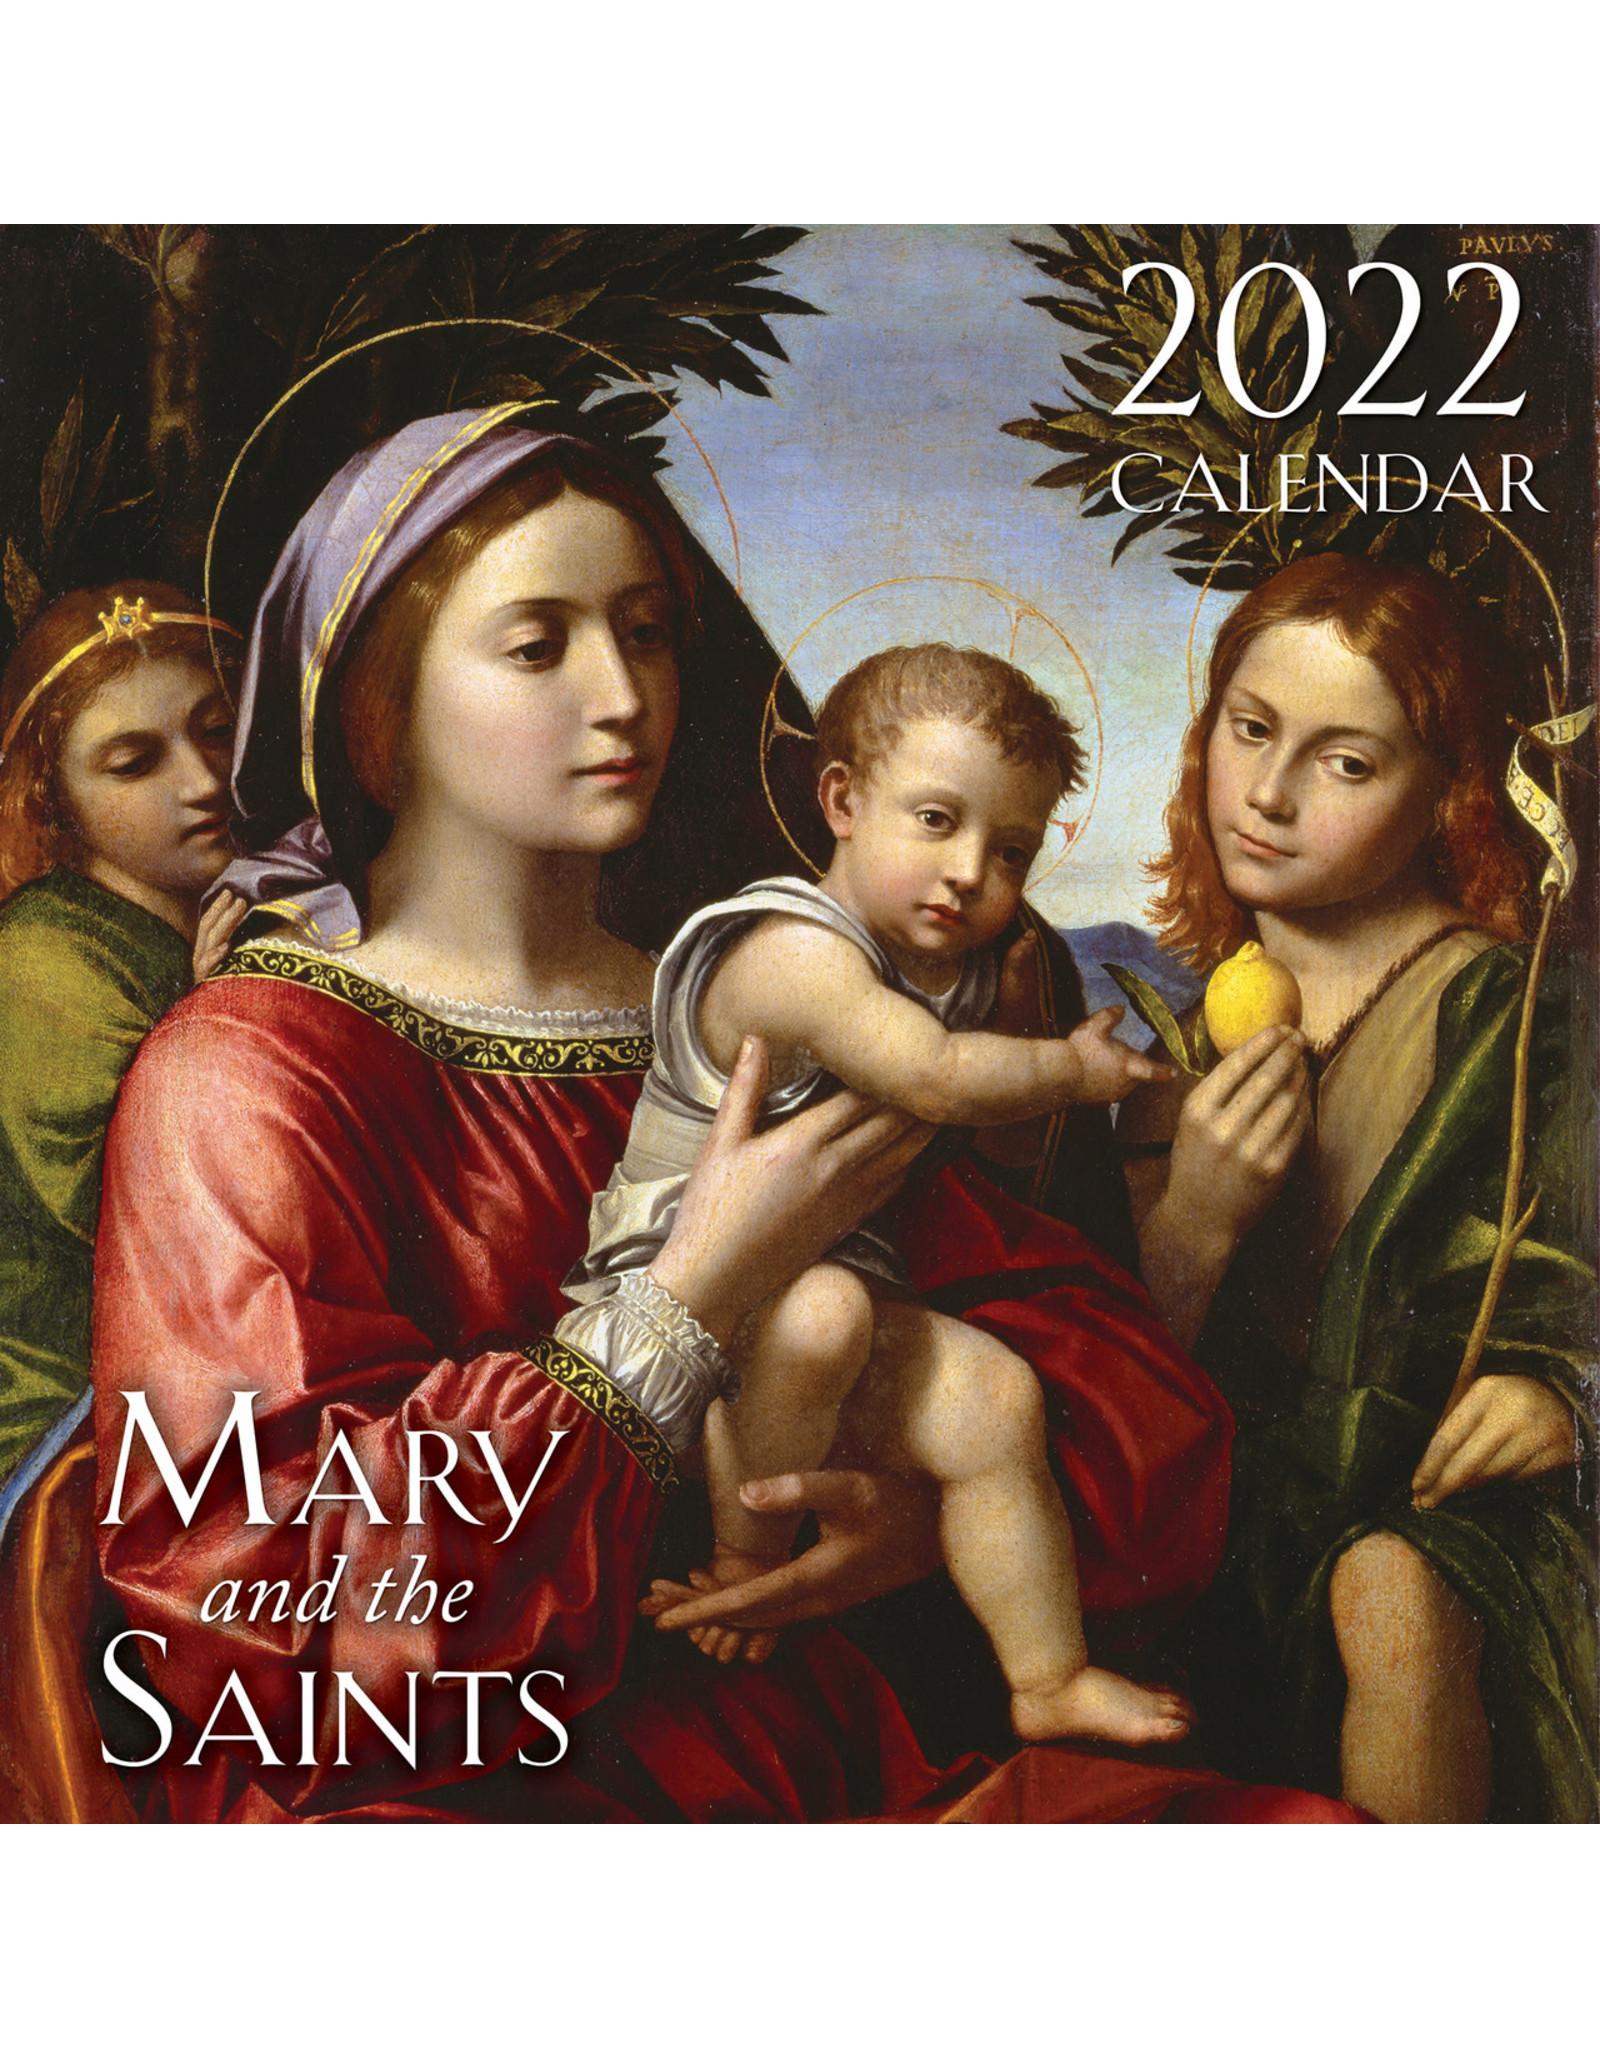 2022 Mary and the Saints Wall Calendar